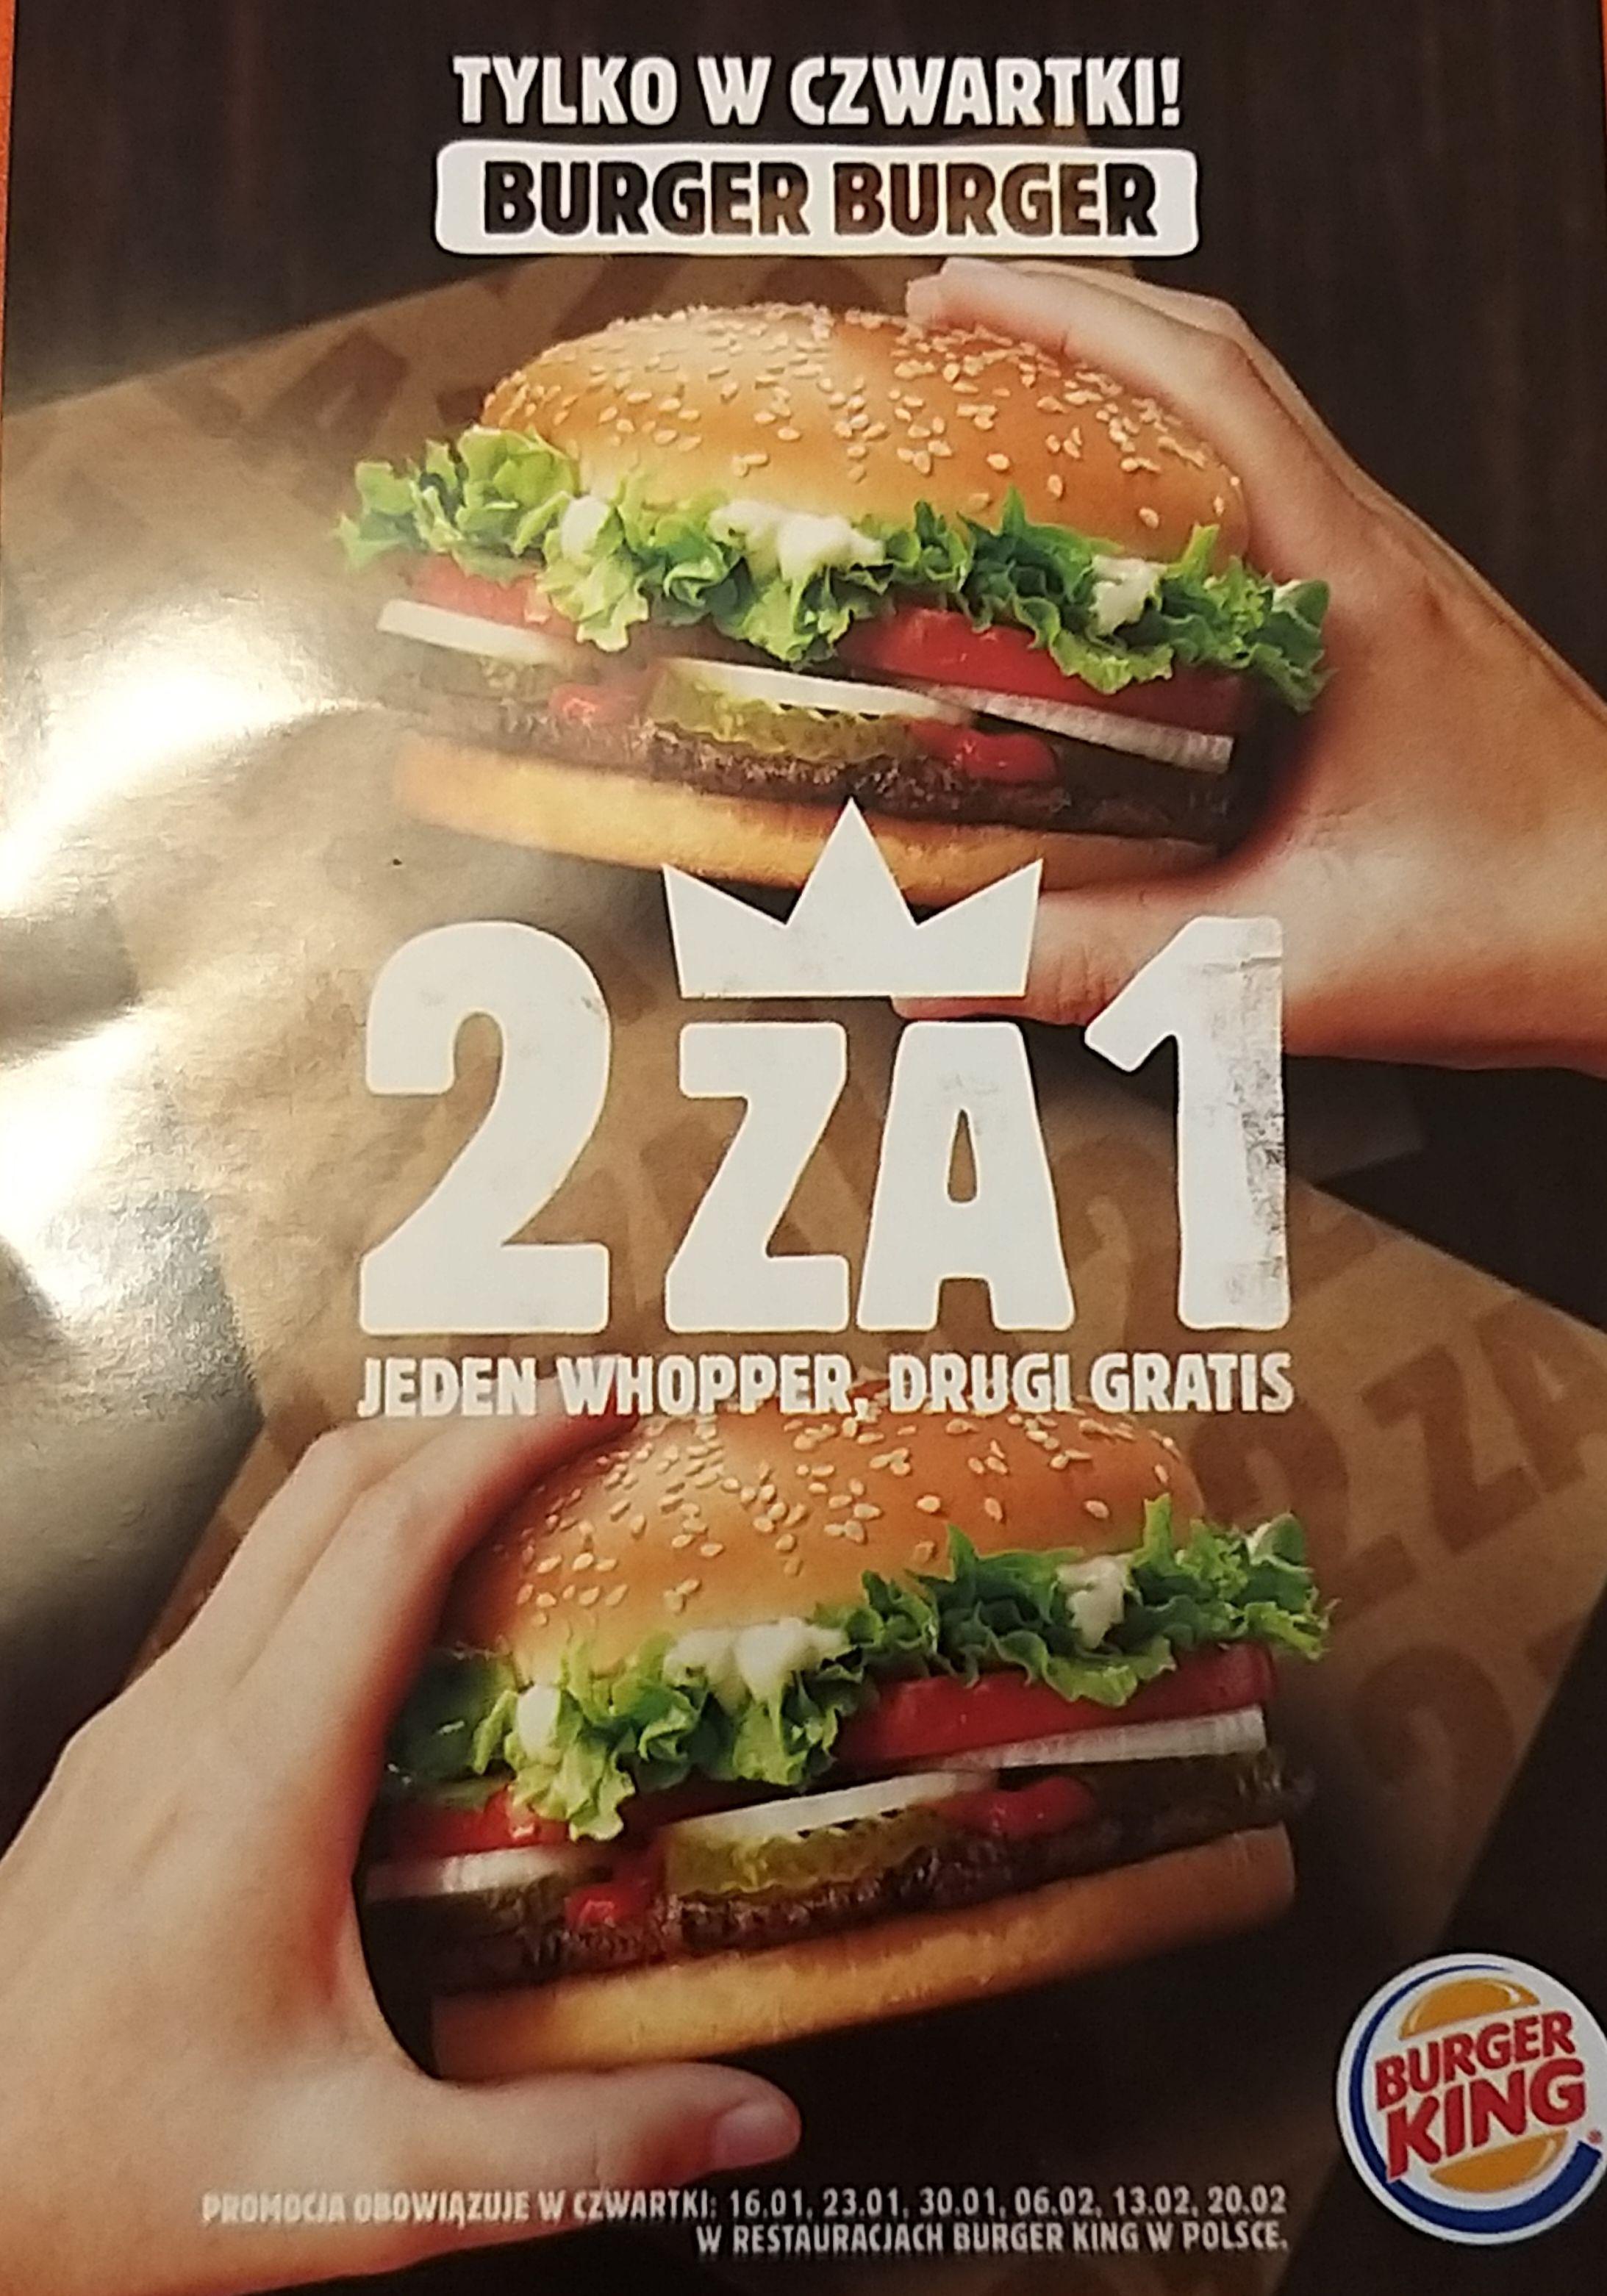 Burger King w czwartek 2za1